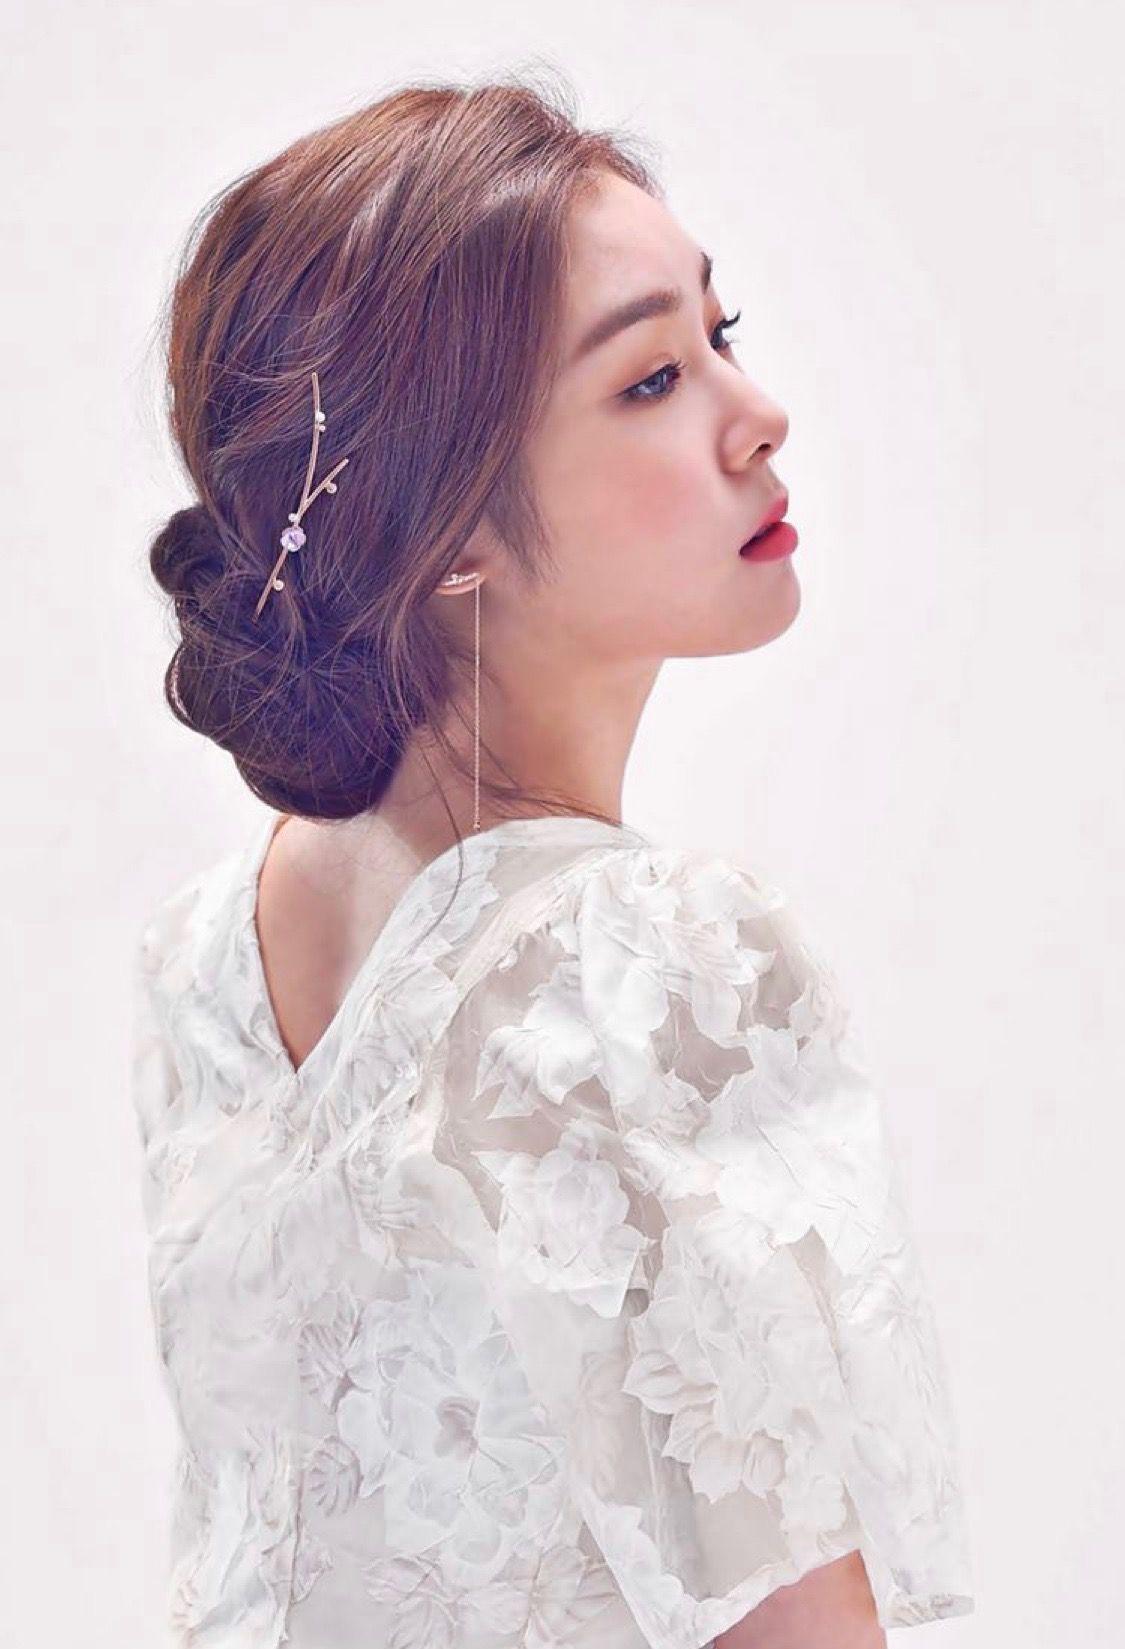 Yuna Kim in 2020 (With images) | Kim yuna, Beauty, Kim